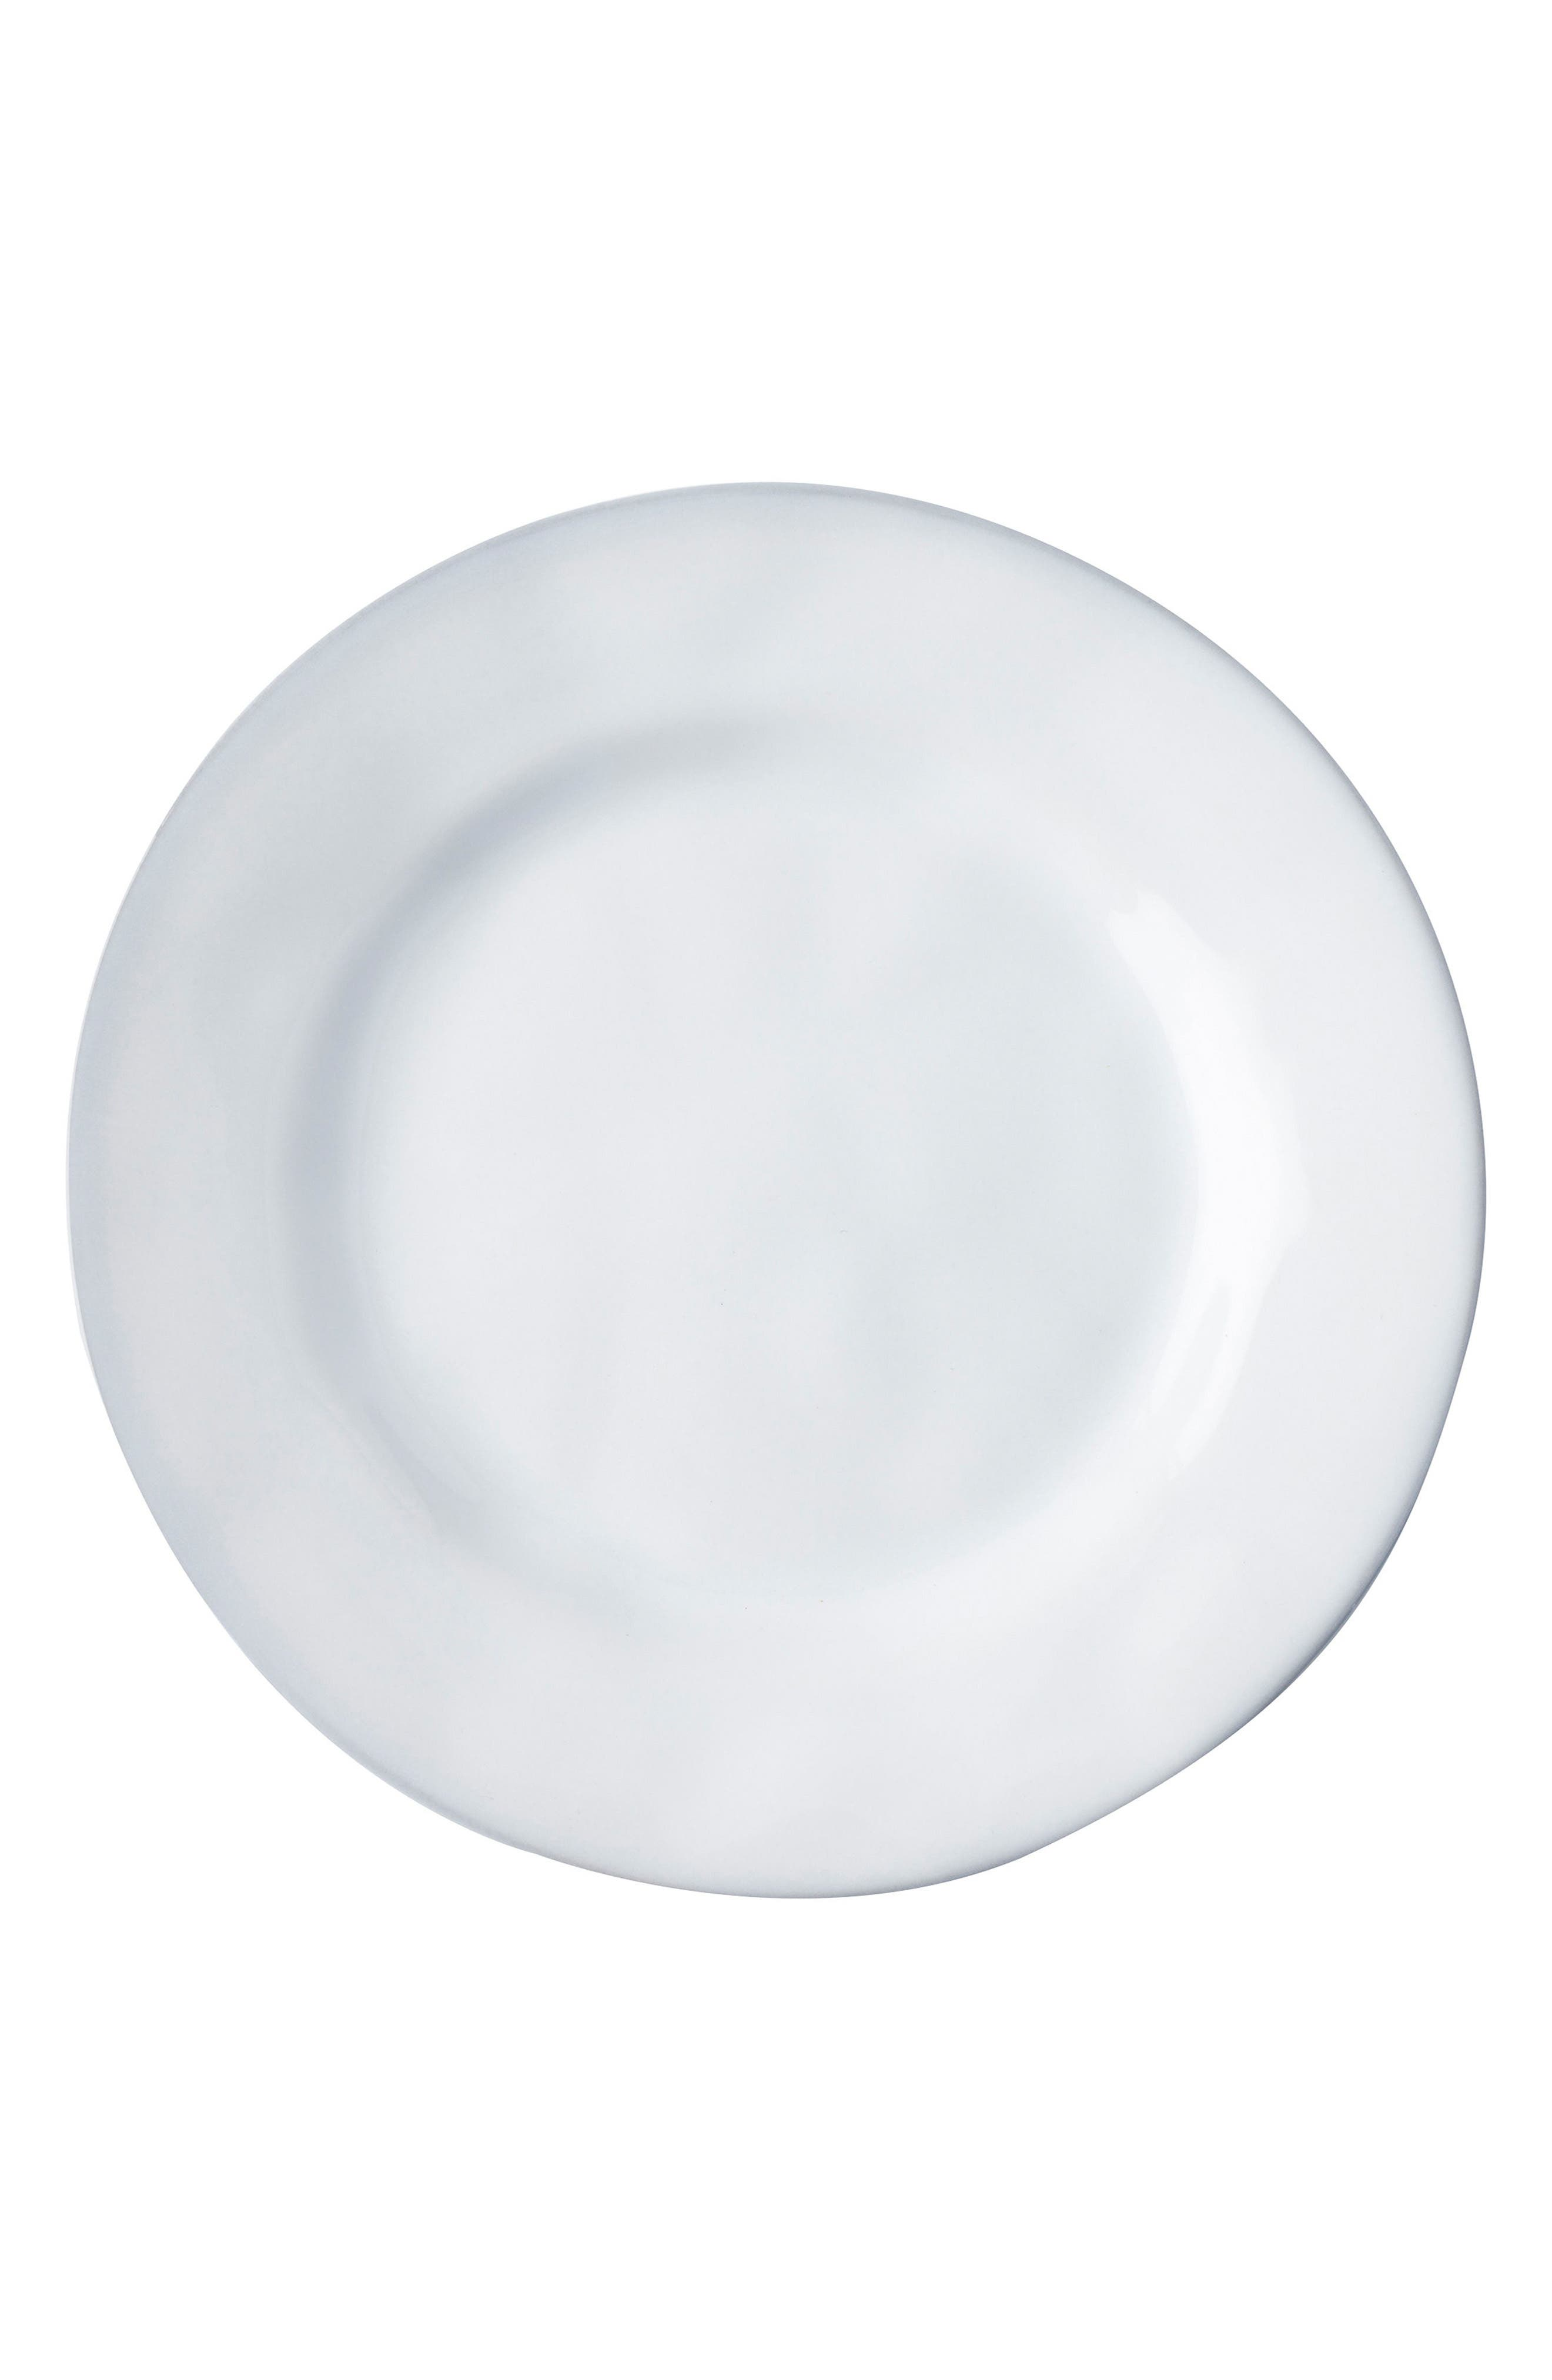 Quotidien White Truffle Ceramic Side Plate,                         Main,                         color, White Truffle